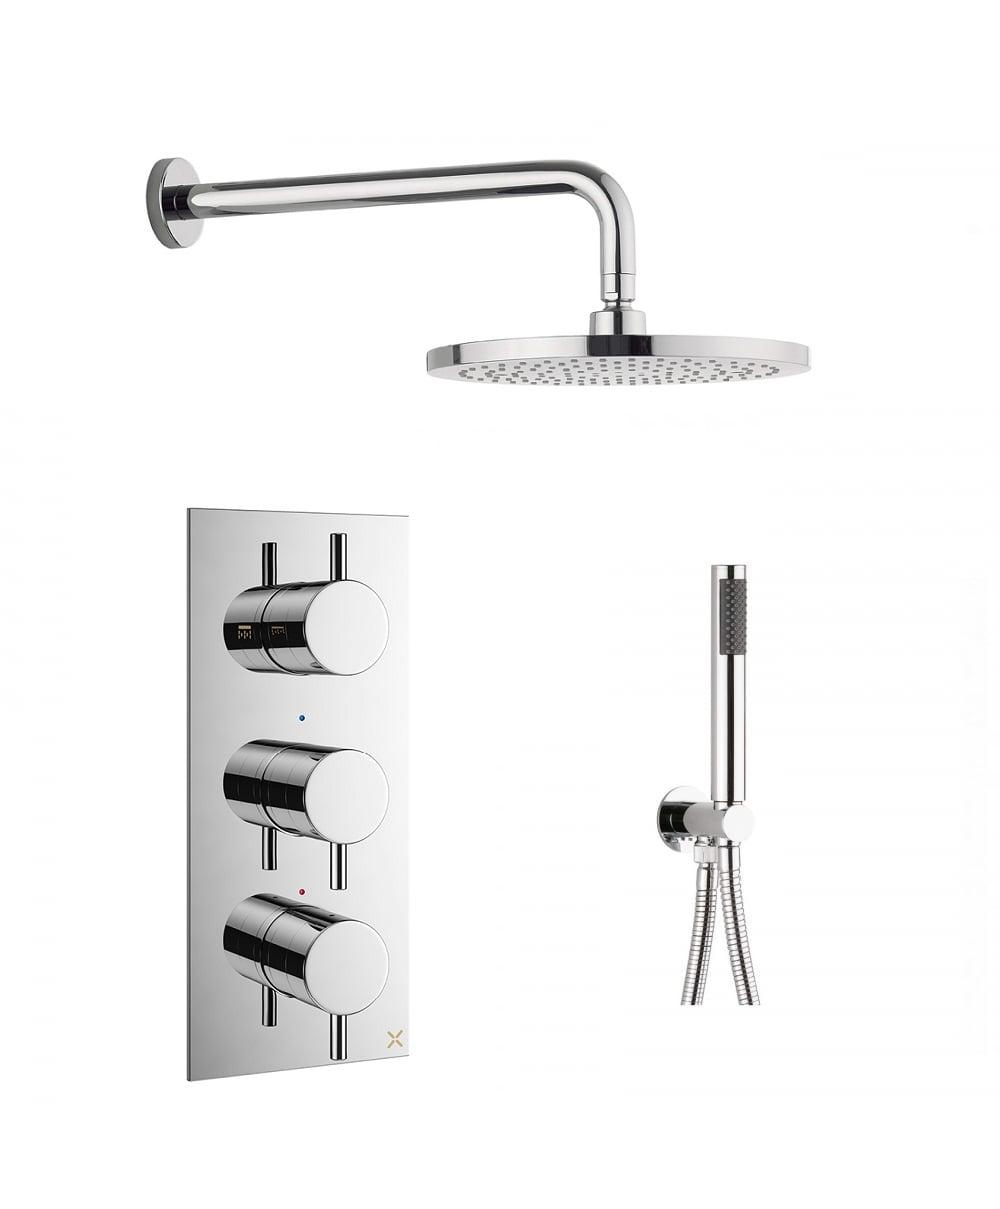 Bathroom Accessories Set Clearance : Clearance bathroom sets